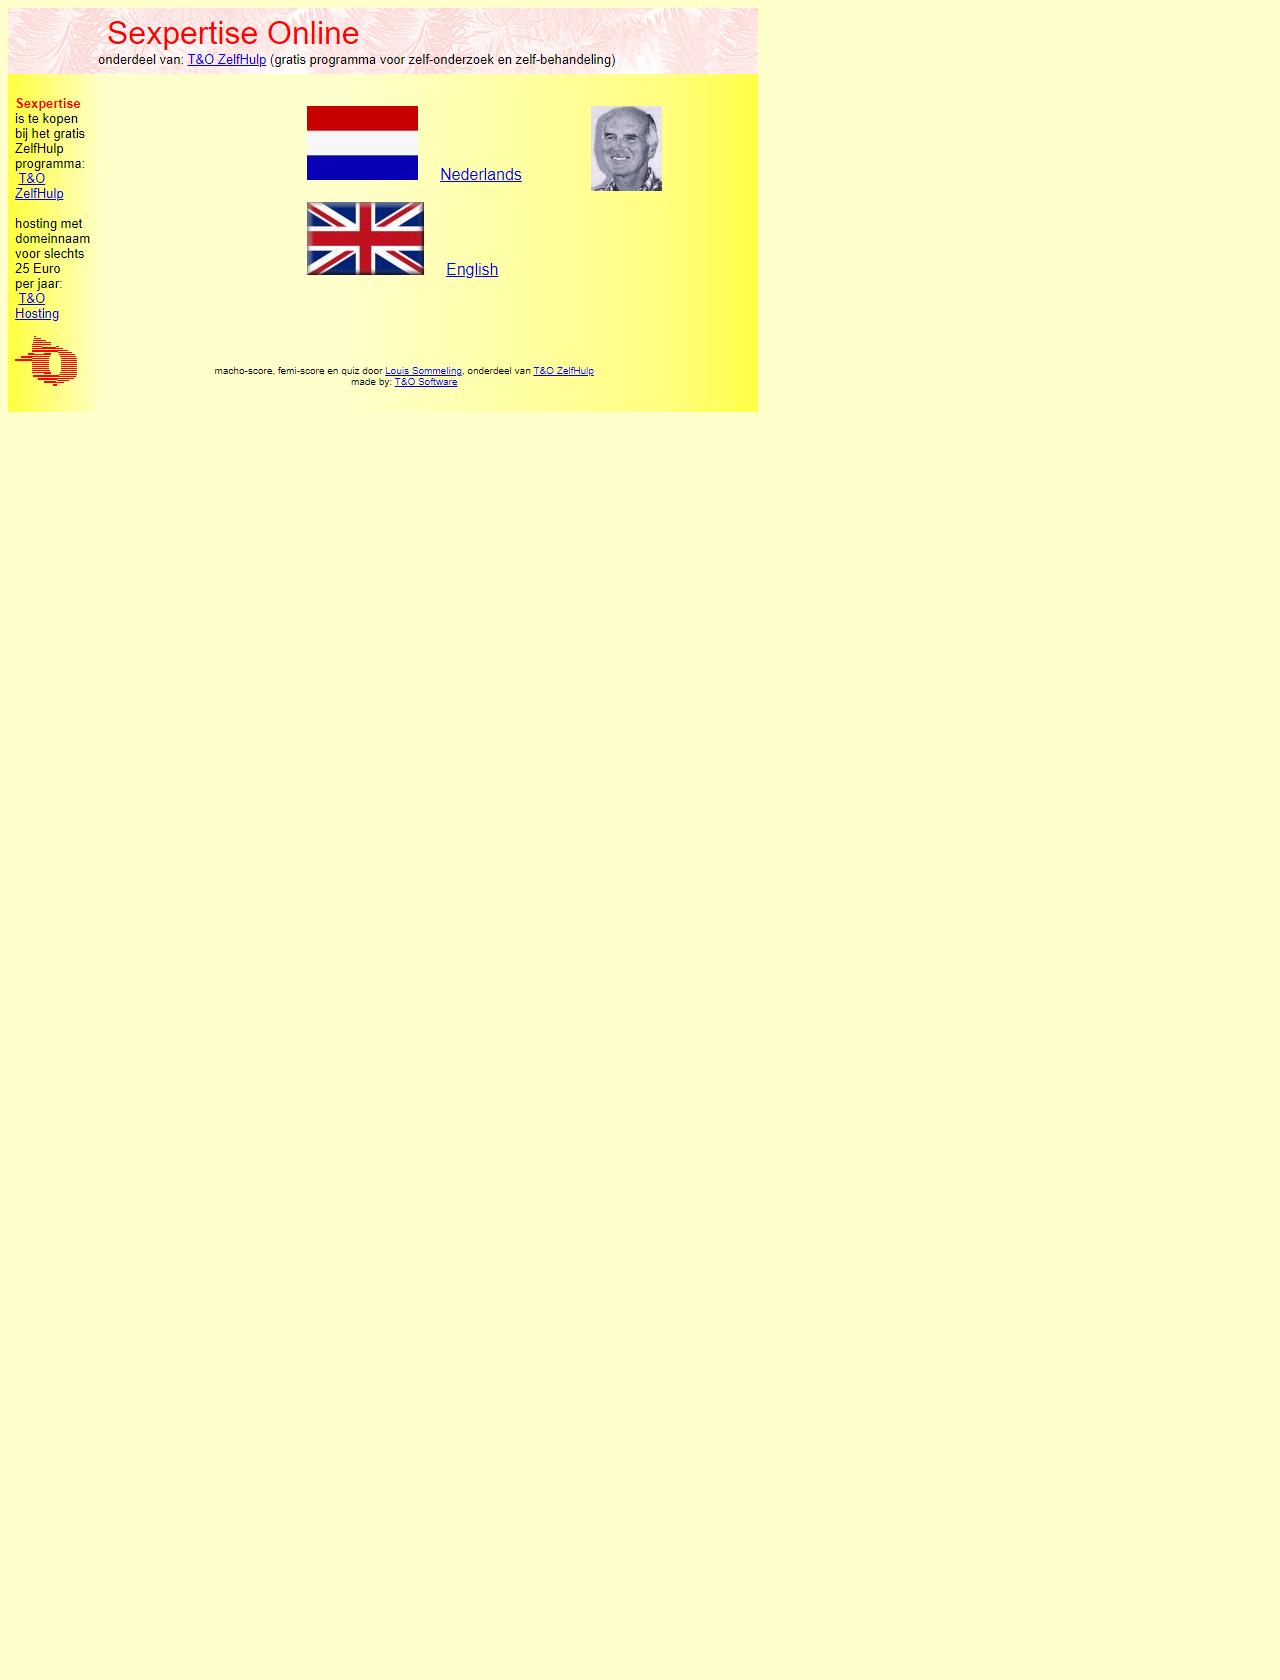 Screenshot Desktop - https://www.sexpertise-online.nl/